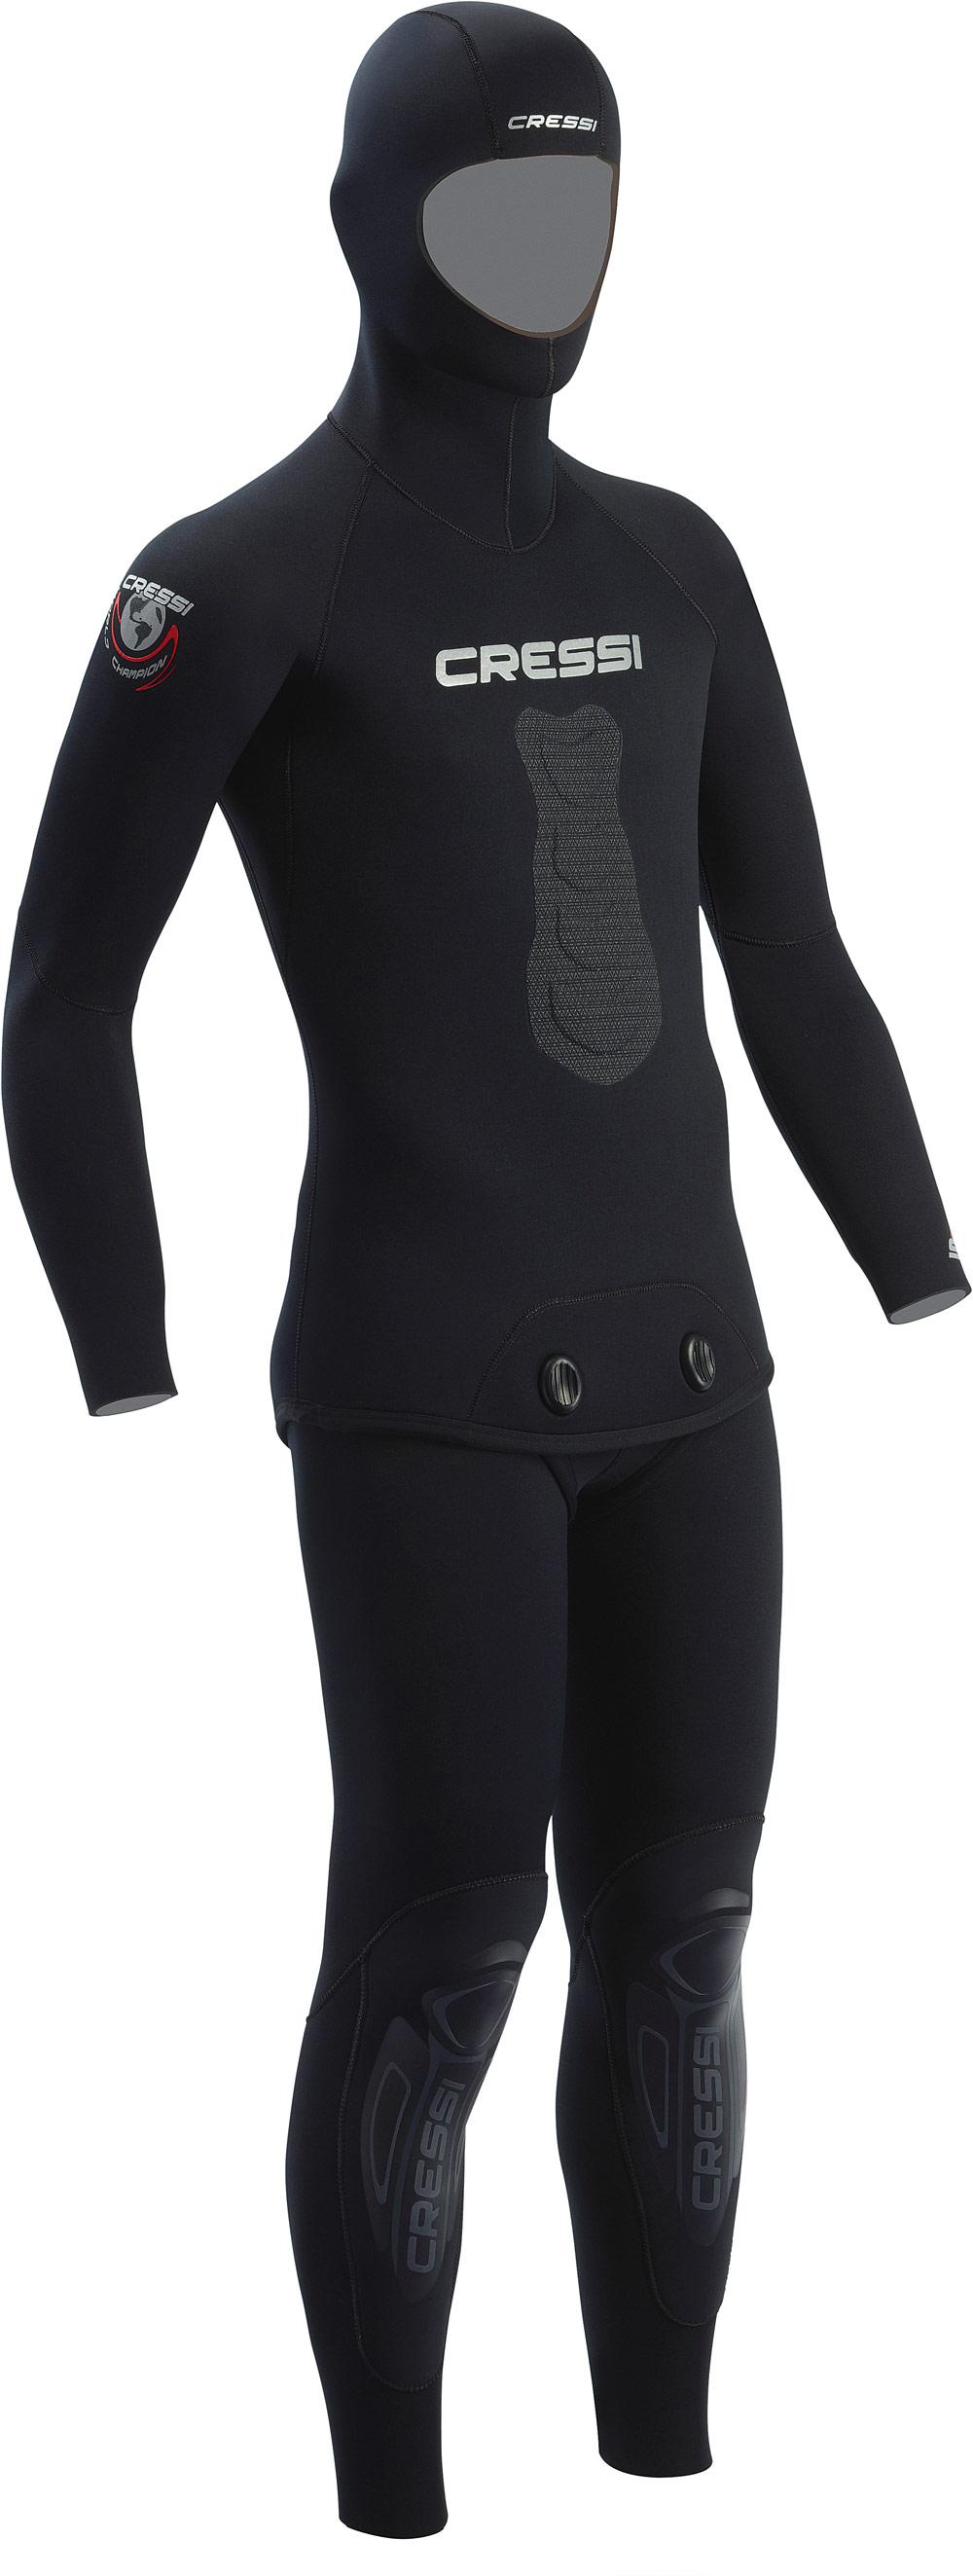 Неопренов костюм за подводен риболов Apnea 5 мм - Cressi